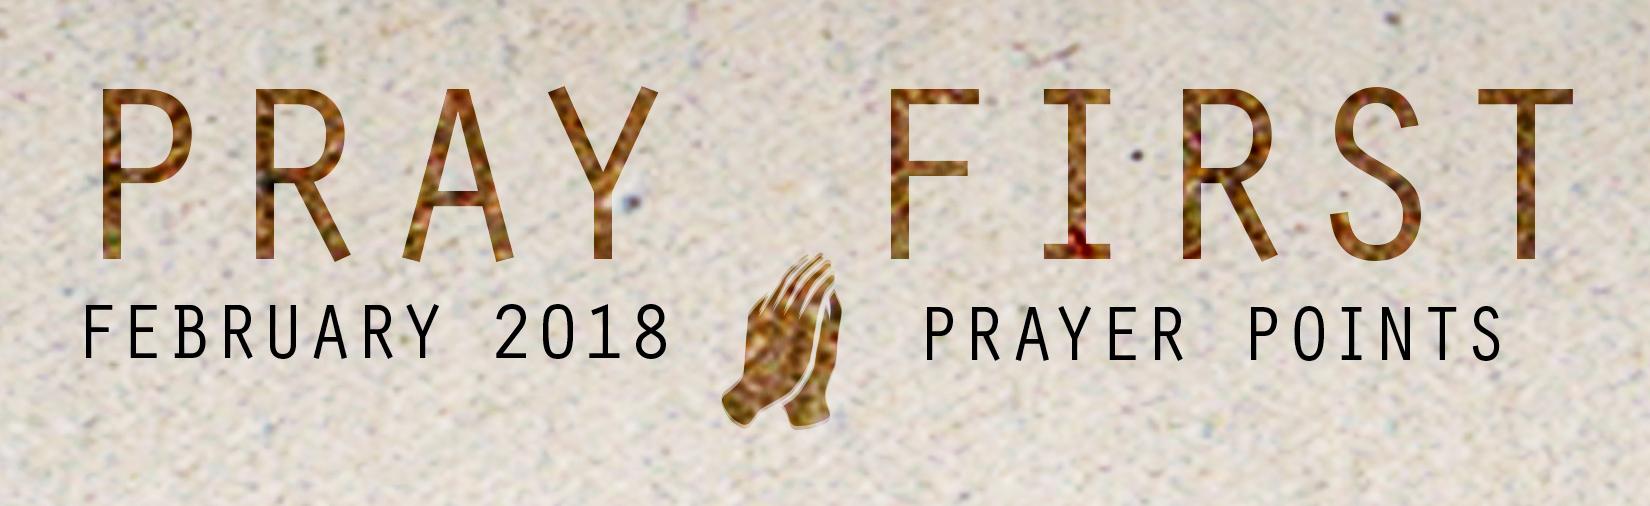 PRAY FIRST Feb 2018 title.jpg